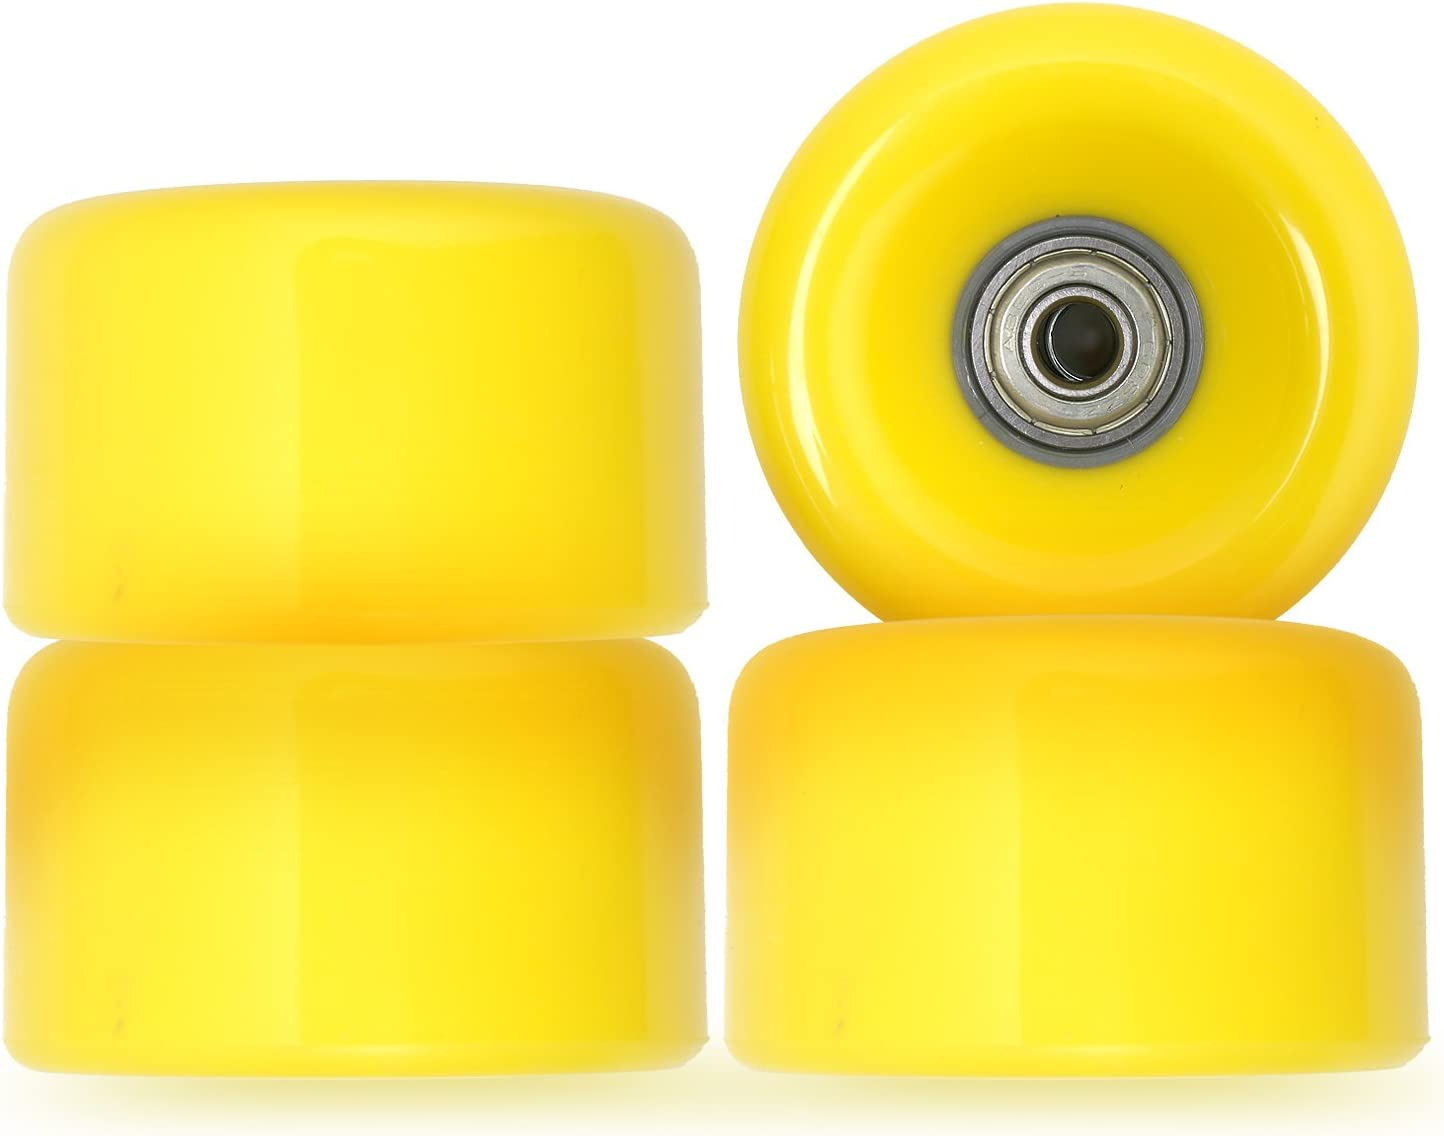 70mm Longboard Skateboard Wheels Set of 4 inc ABEC5 Bearings /& Spacers 78A